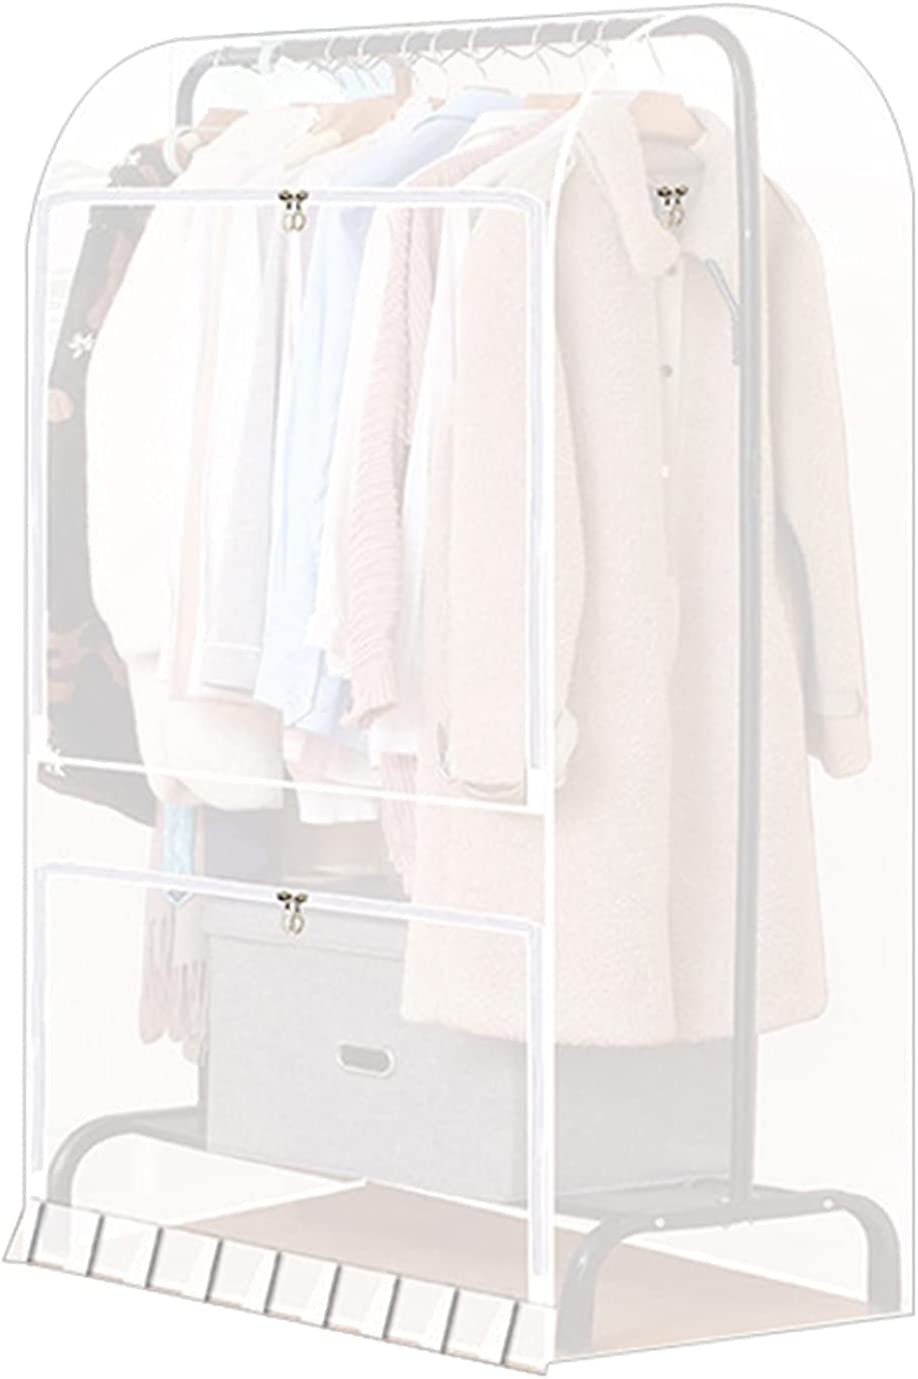 Garment Rack Cover 4.9ft PEVA Clothing Gorgeous 150cm Discount mail order Translucent